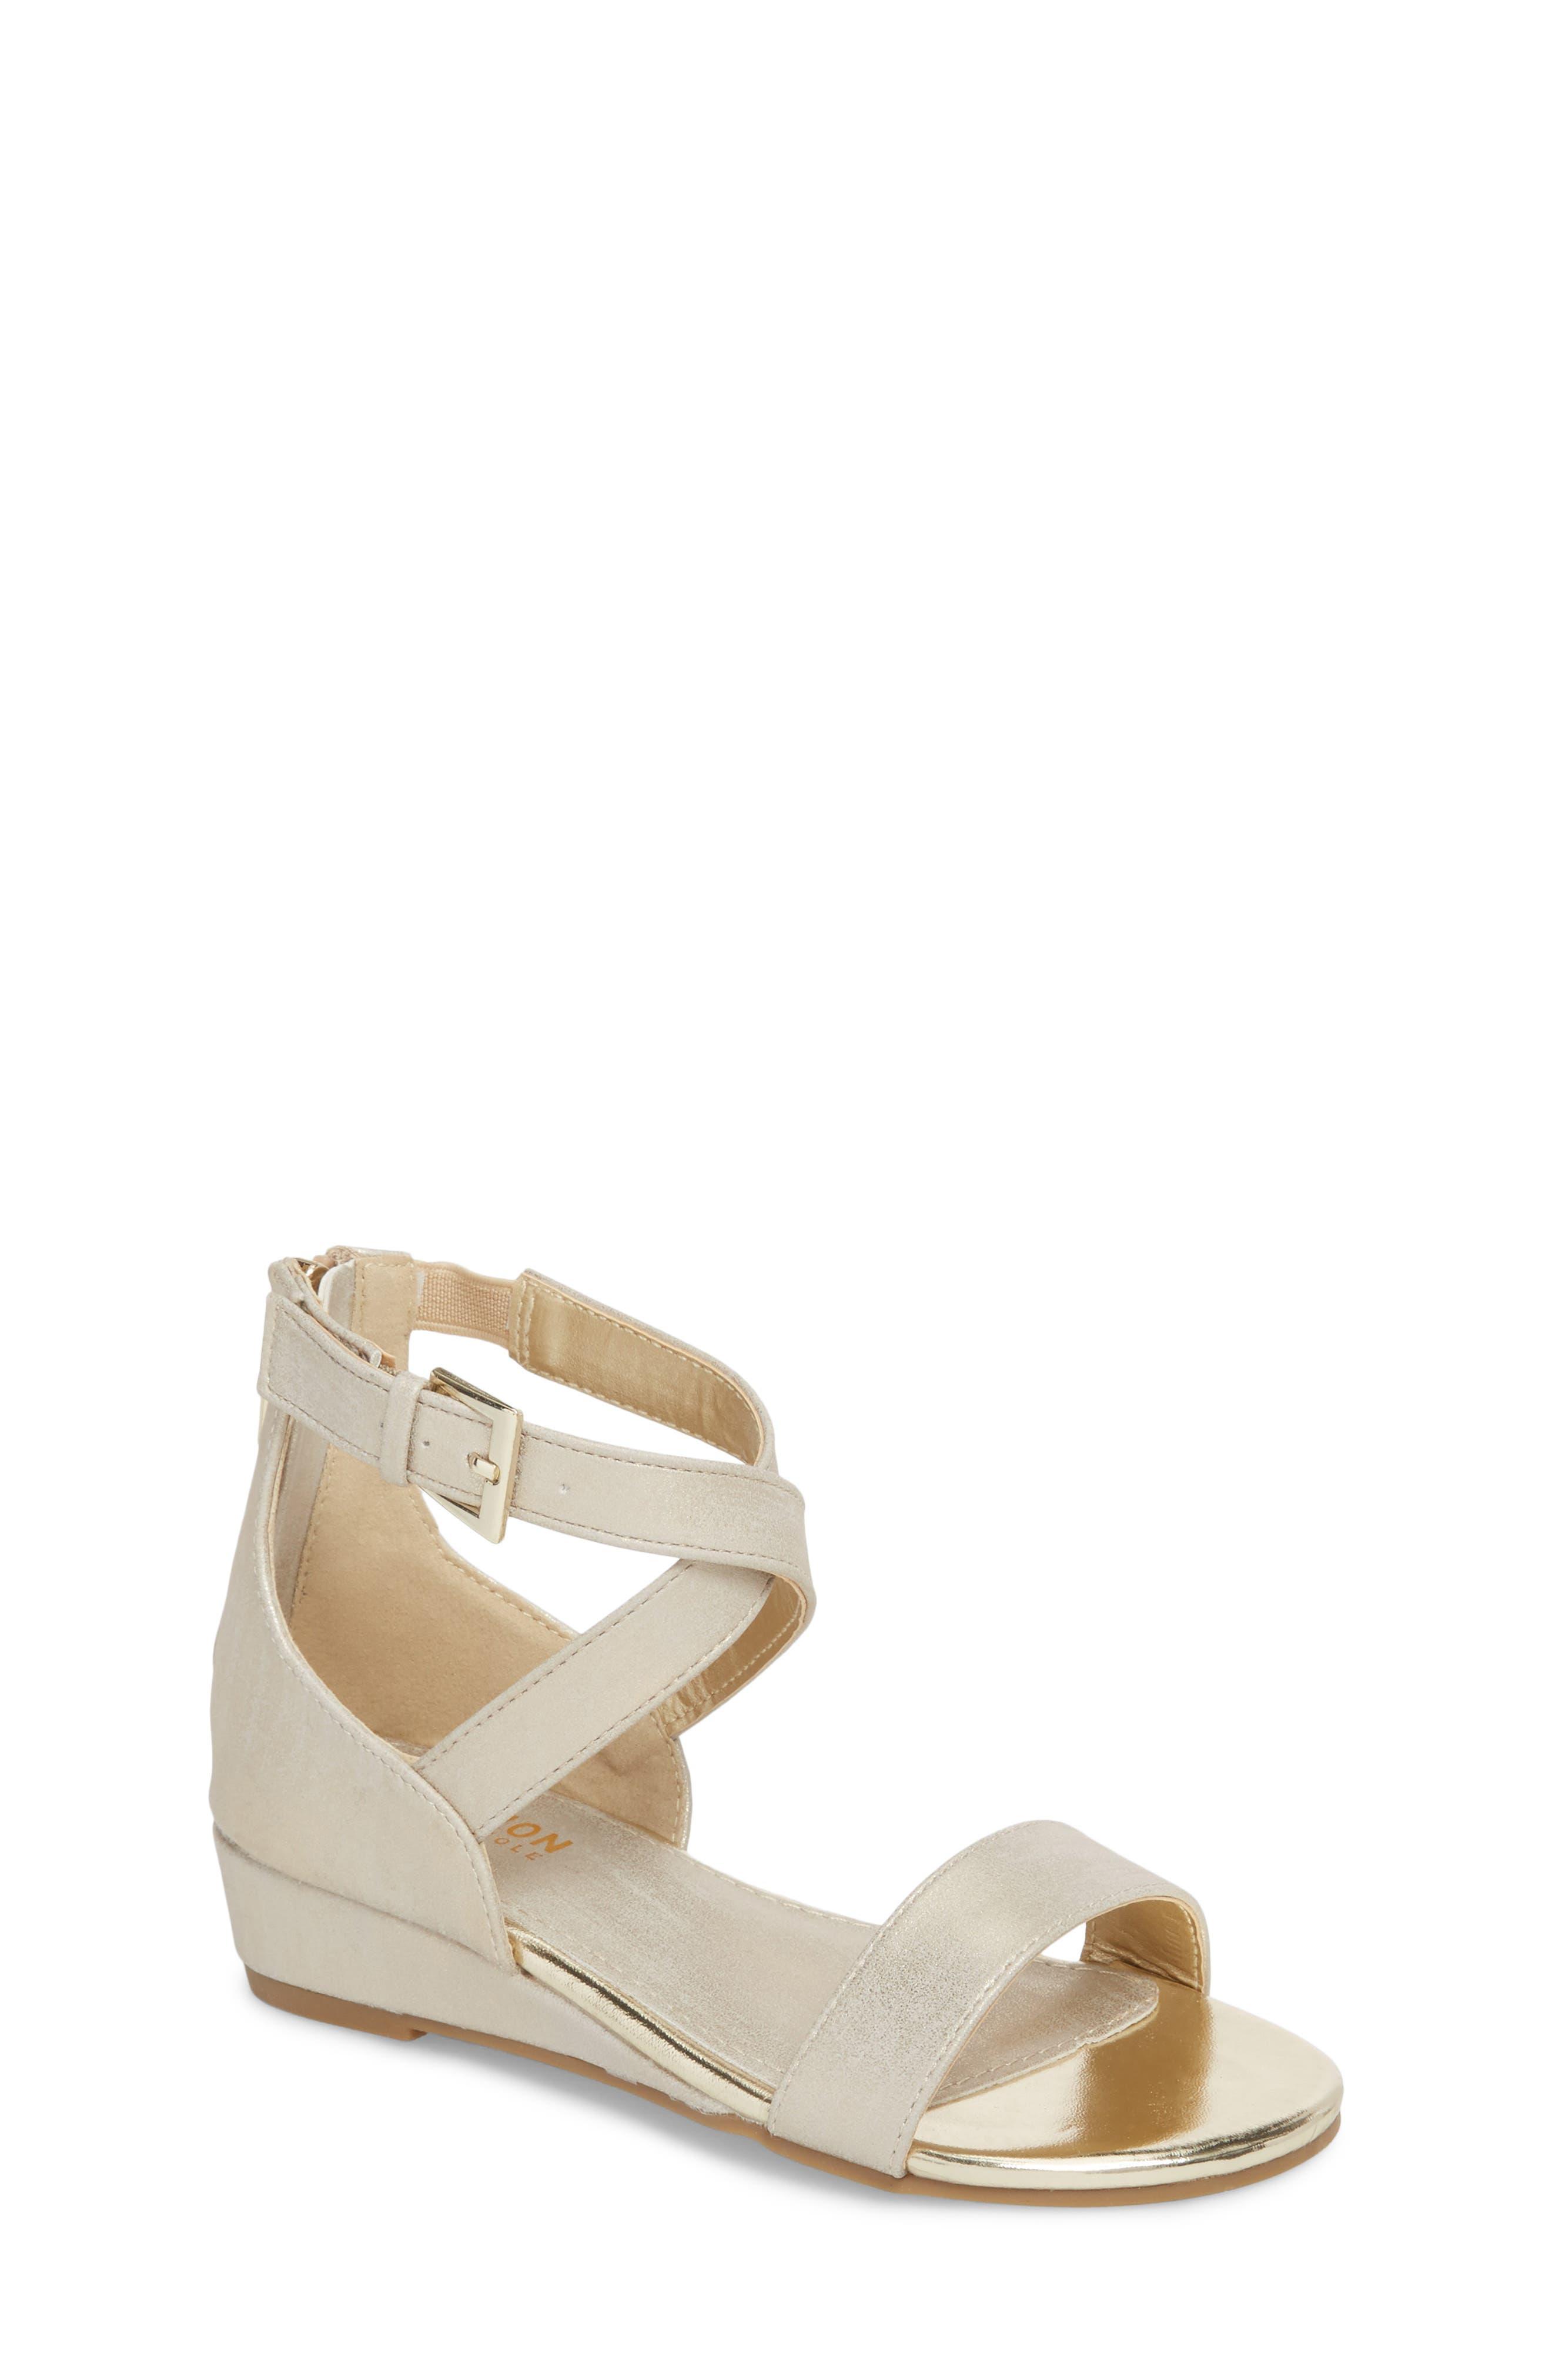 Reaction Kenneth Cole Mode Metallic Sandal,                         Main,                         color, Gold